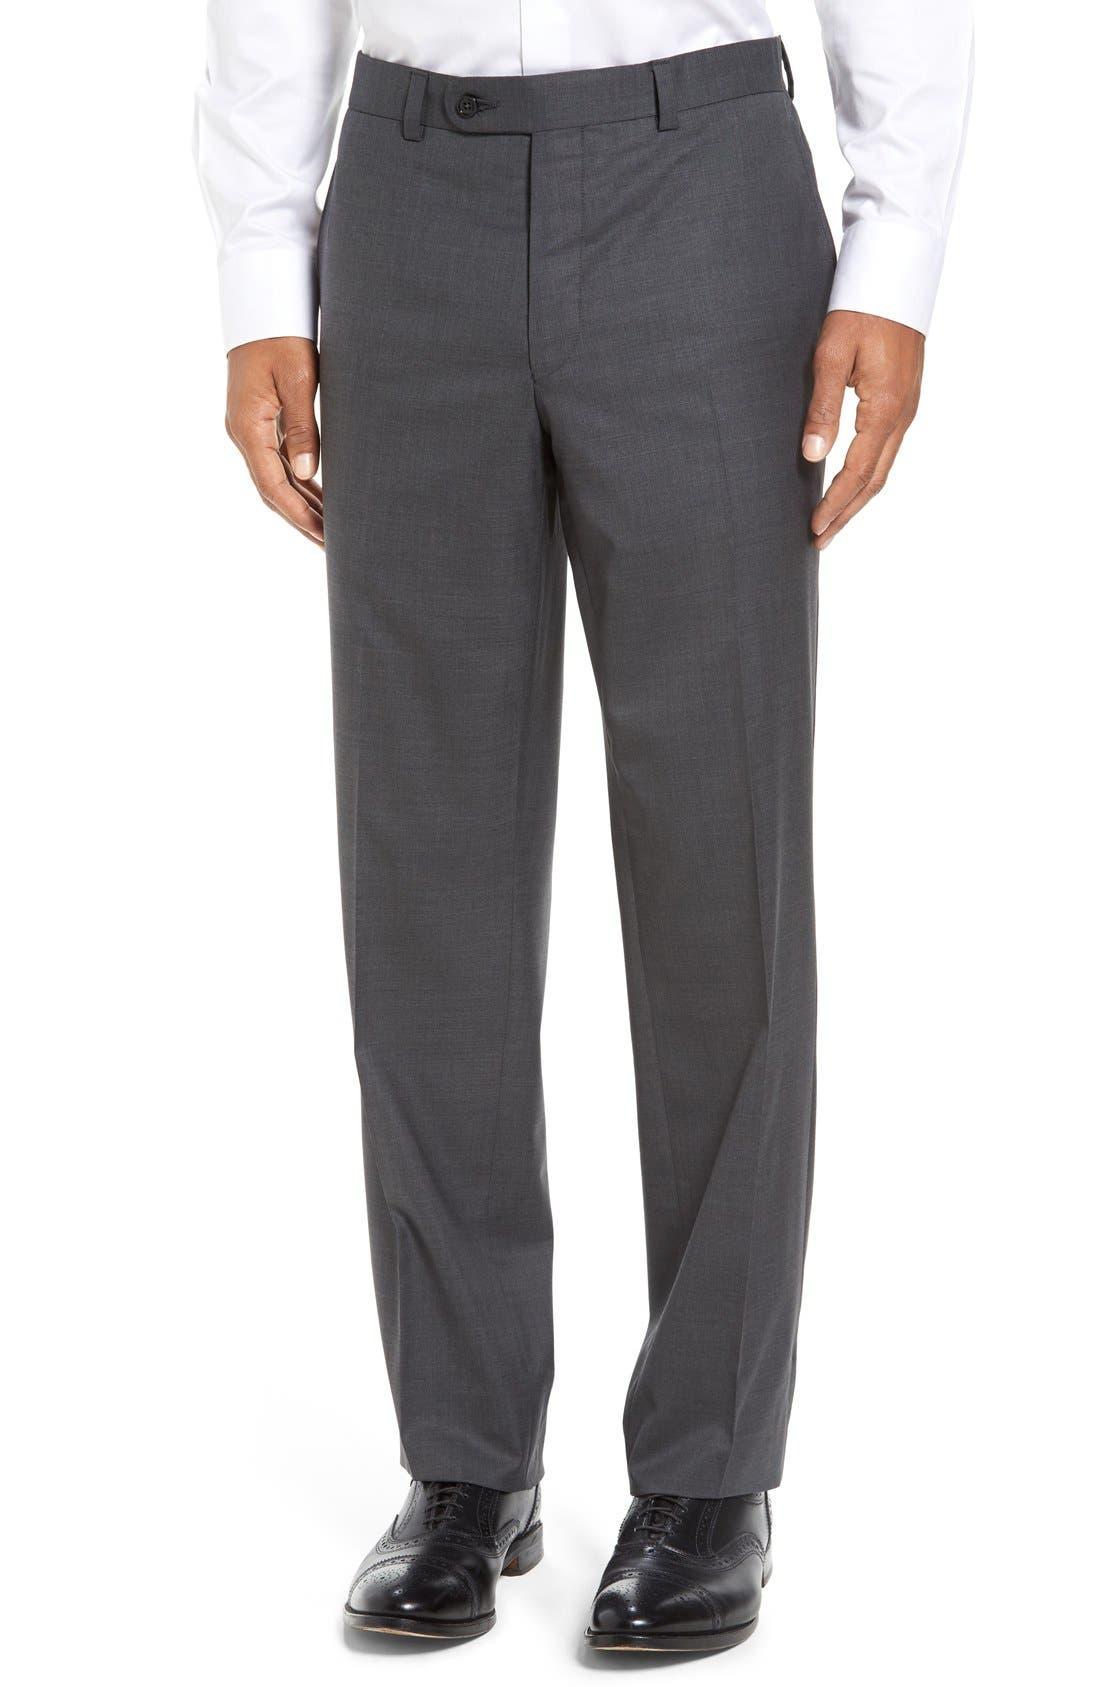 Ryan Regular Fit Wool Trousers,                             Main thumbnail 1, color,                             Charcoal